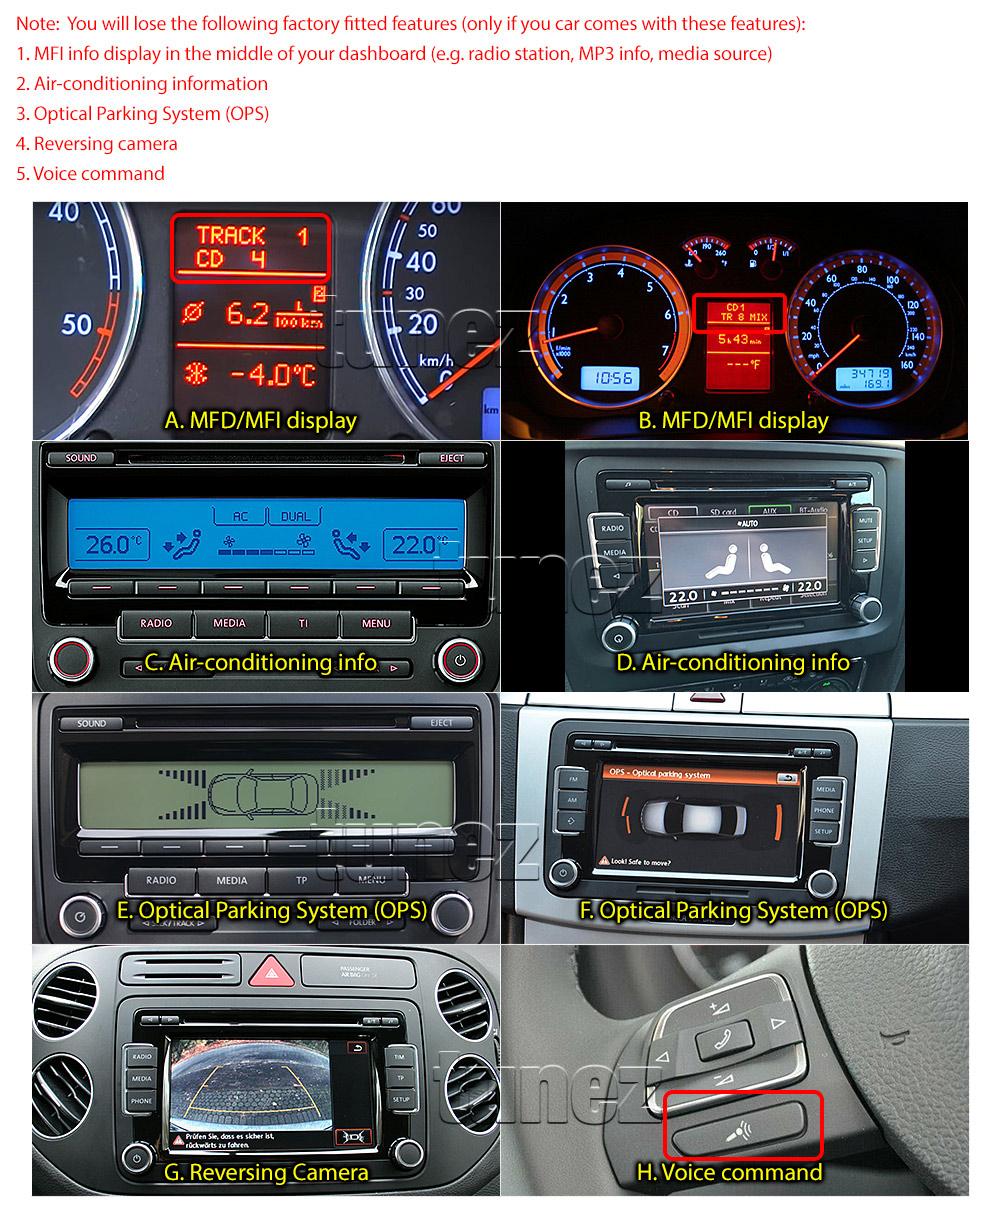 Car Gps Dvd Mp3 Player Volkswagen Amarok Golf Polo Stereo